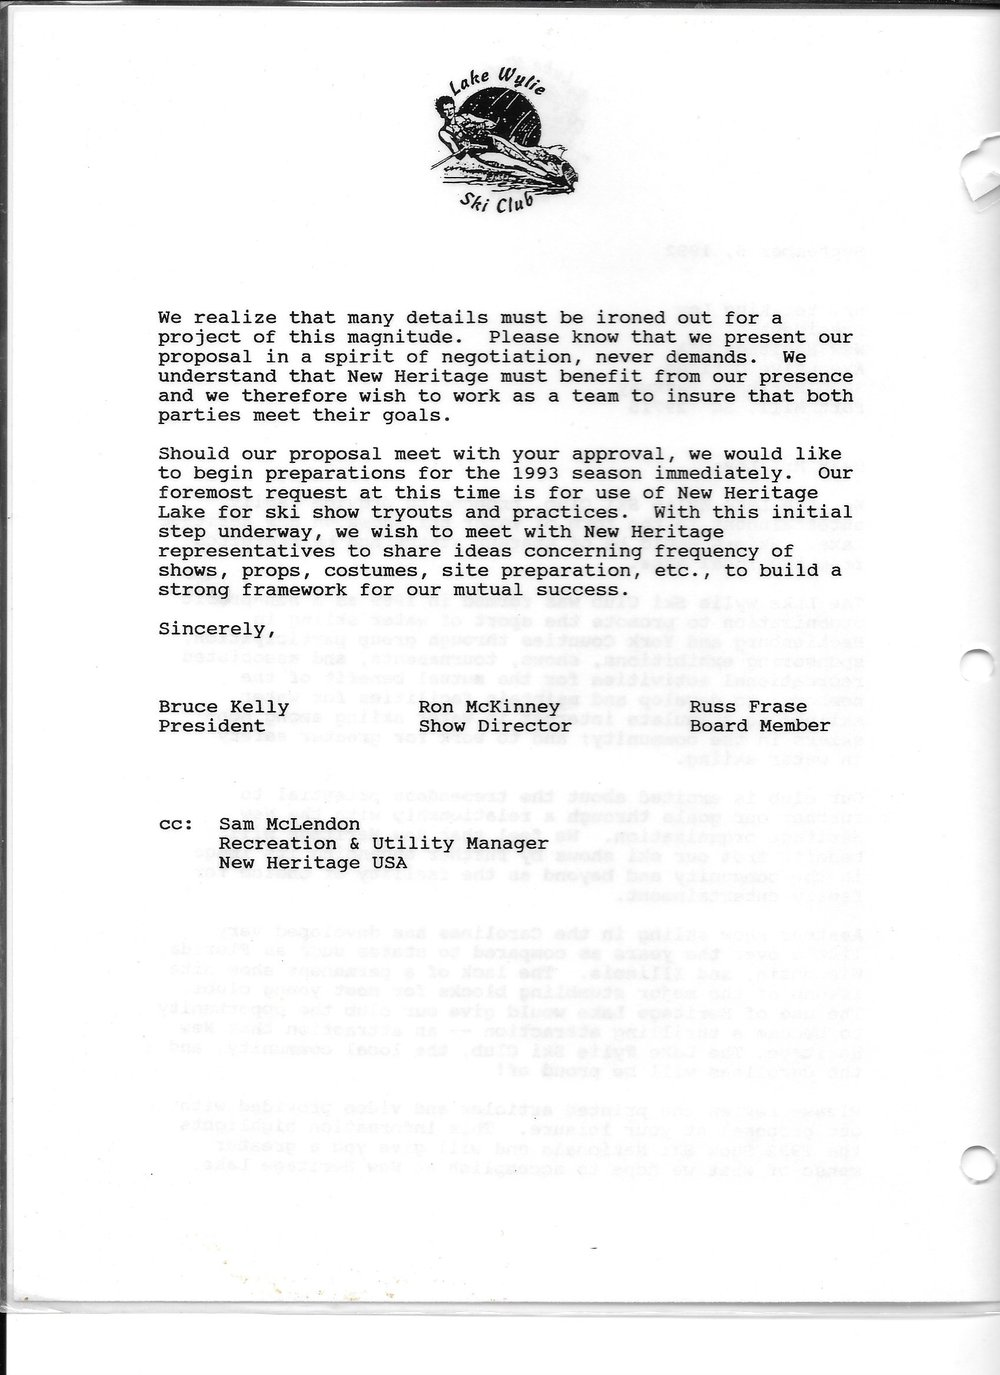 Heritage Proposal (2) 1992.jpg